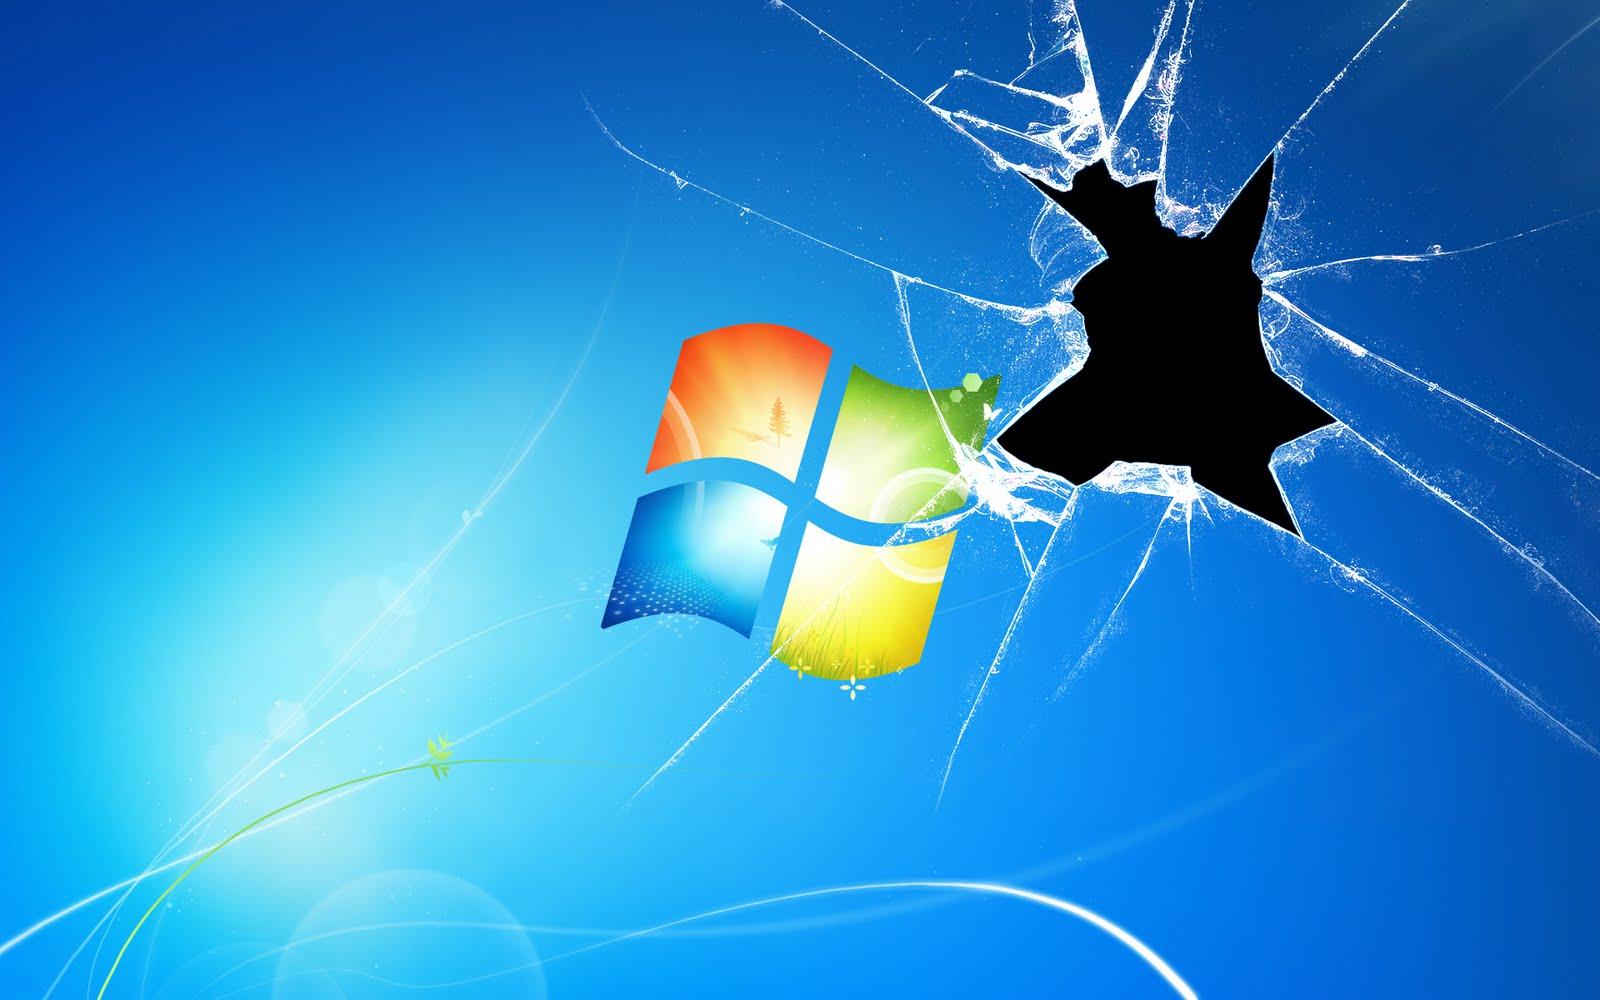 windows 7 broken desktop wallpaper hd windows 7 wallpaper hd windows 7